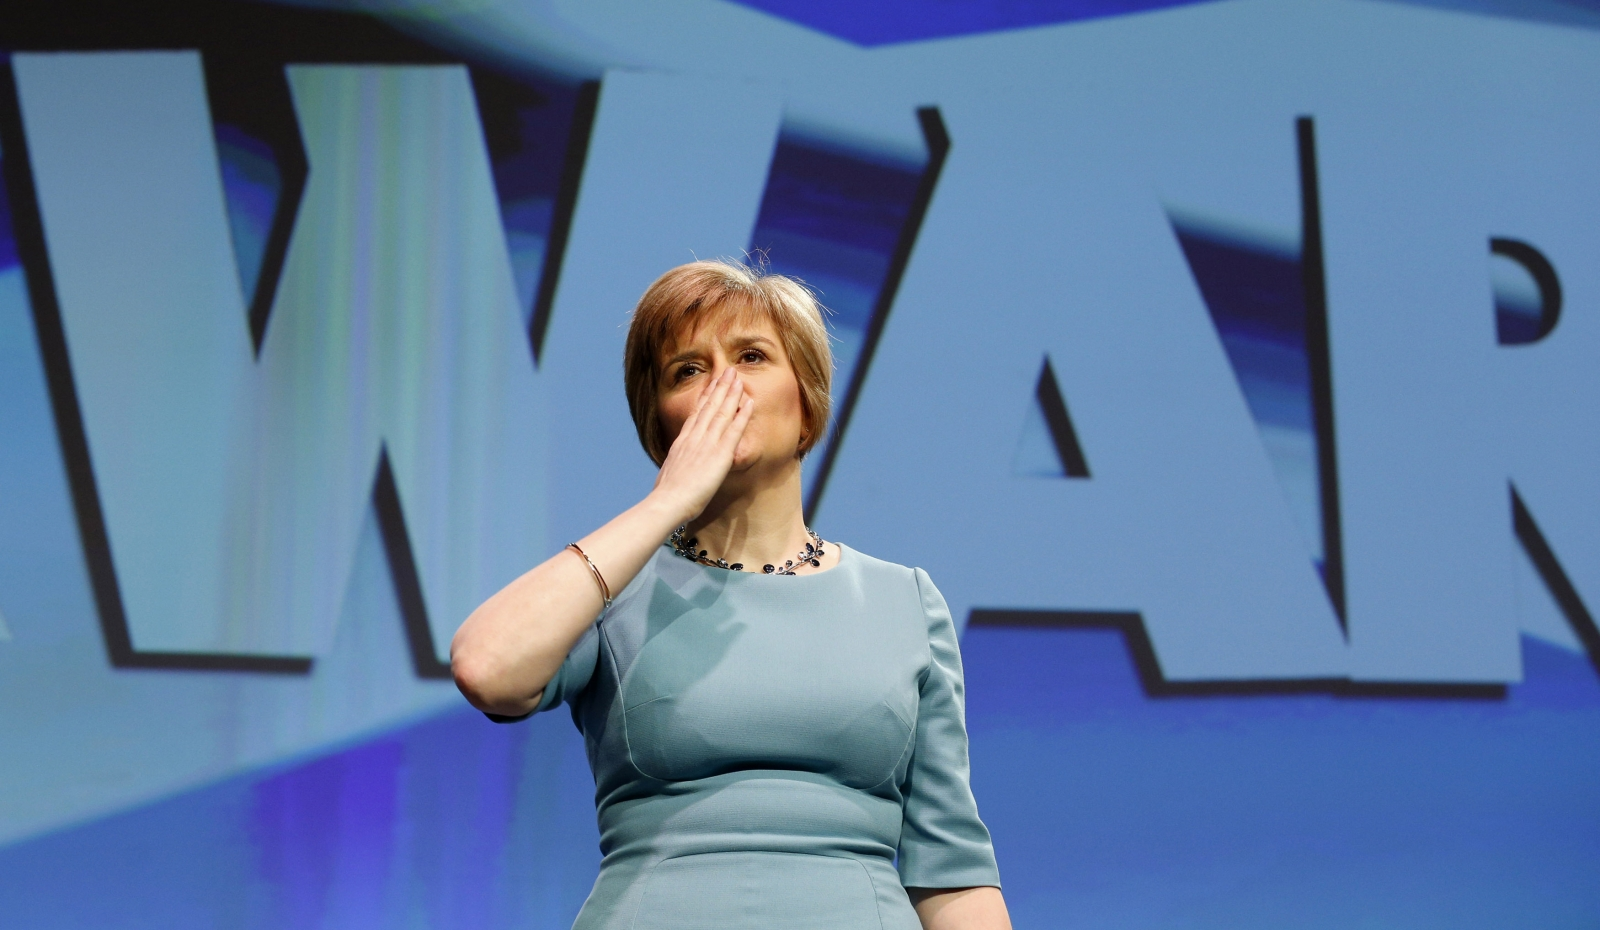 Scotland's Deputy First Minister Nicola Sturgeon blows a kiss following a speech in front of a Forward banner